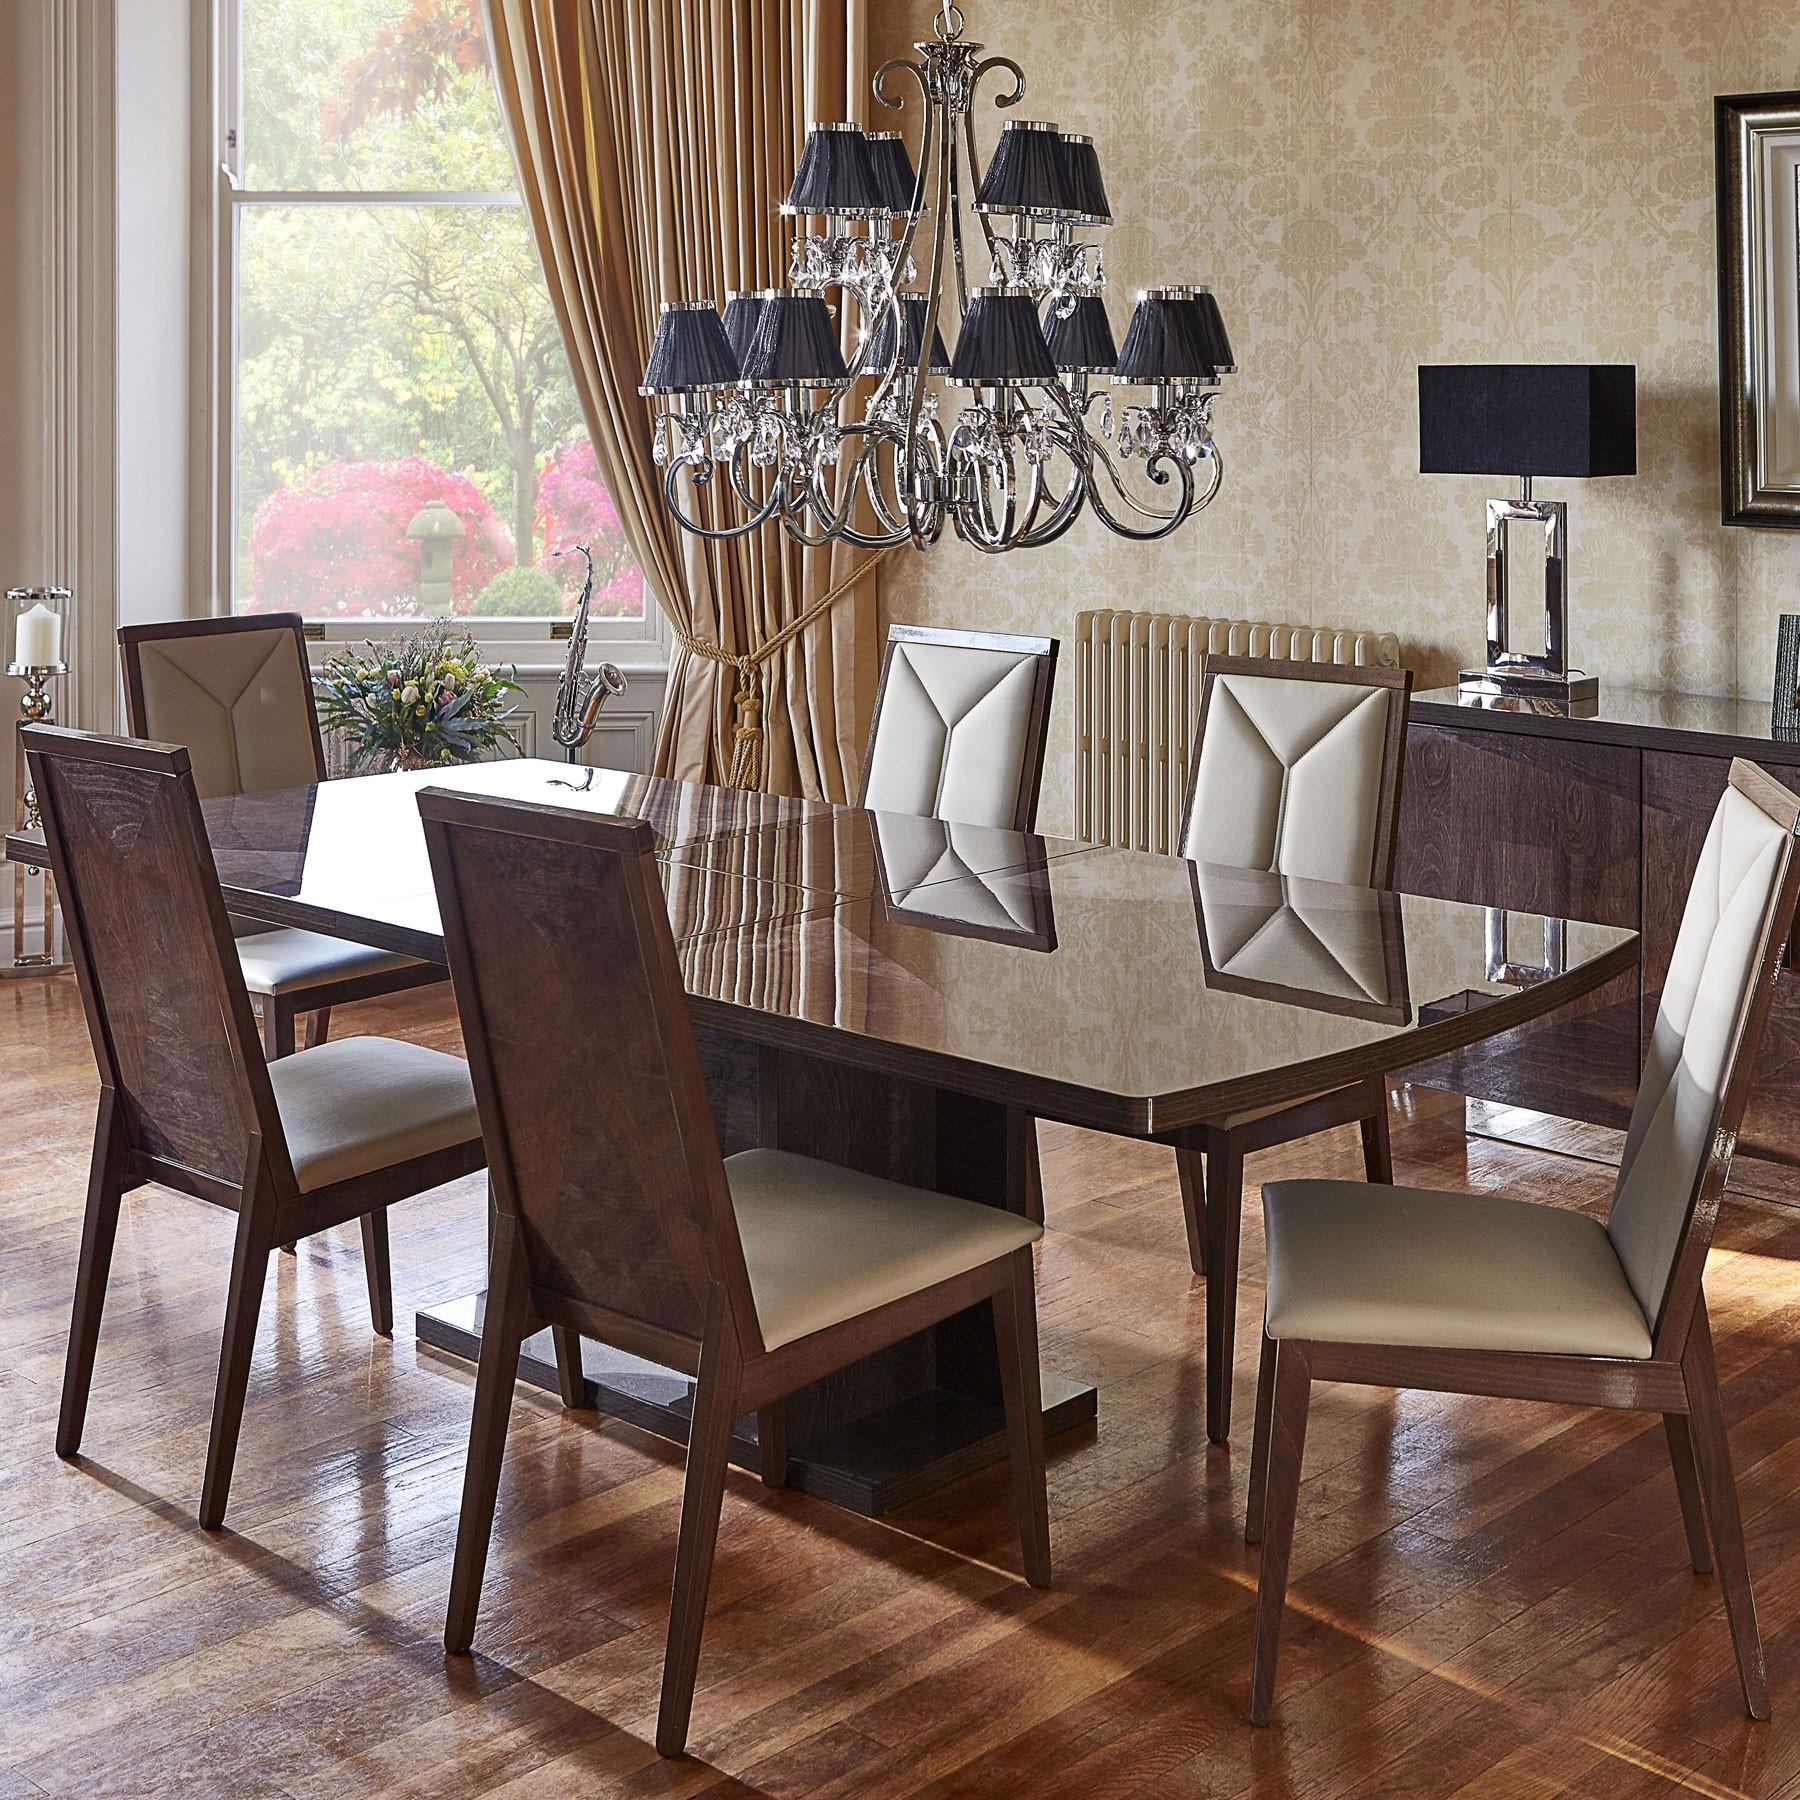 Favorite Vogue High Gloss Extending Dining Table & 6 Chairs Throughout Extending Gloss Dining Tables (View 10 of 25)